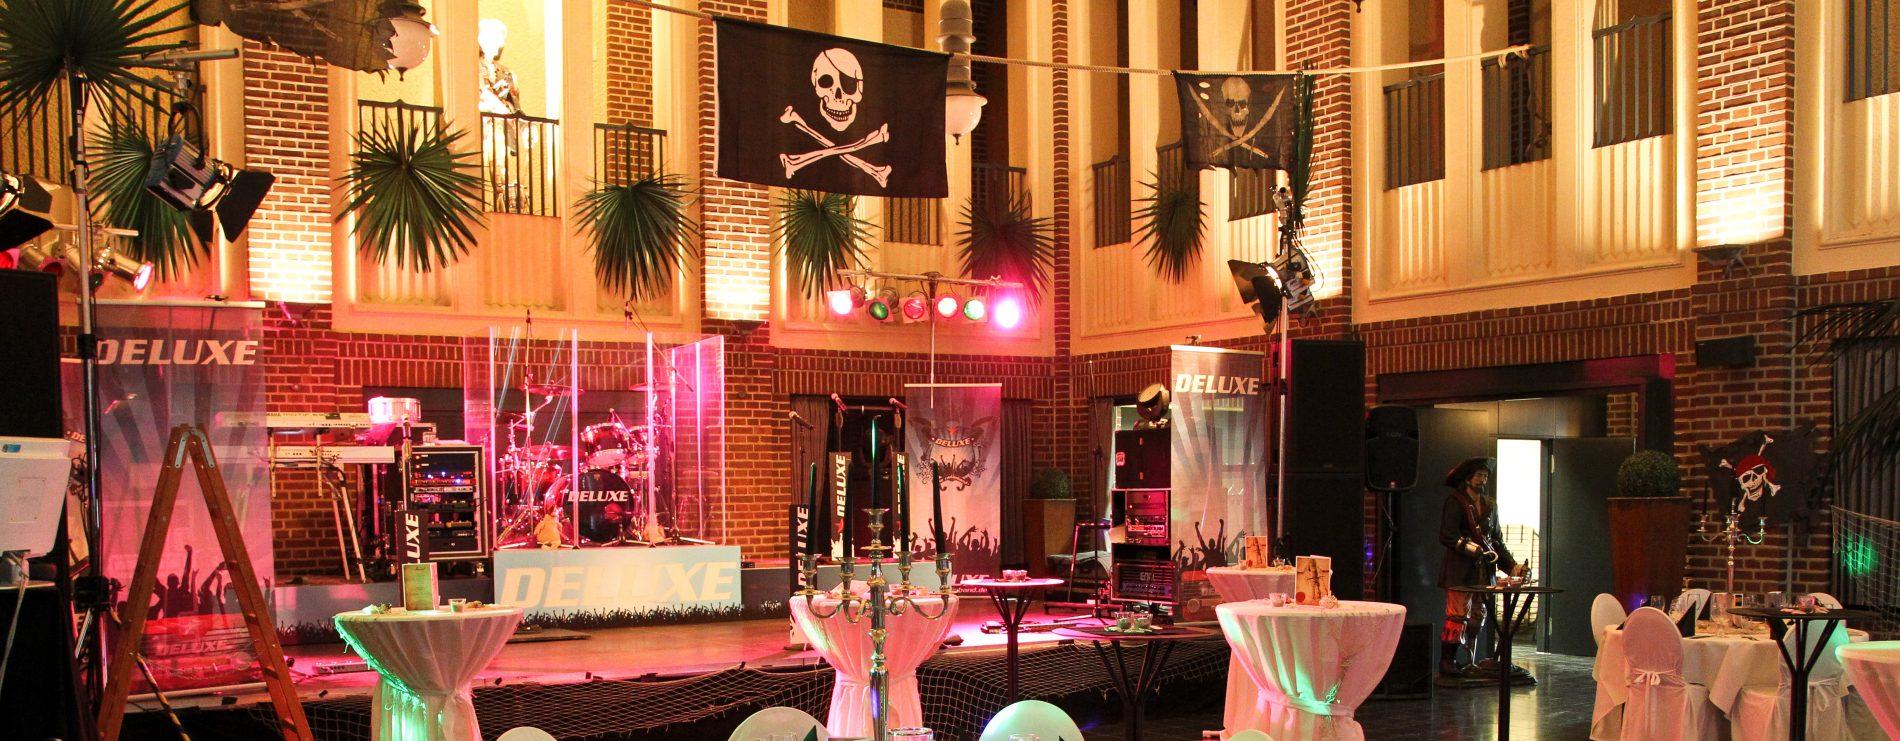 Piraten Event Deko